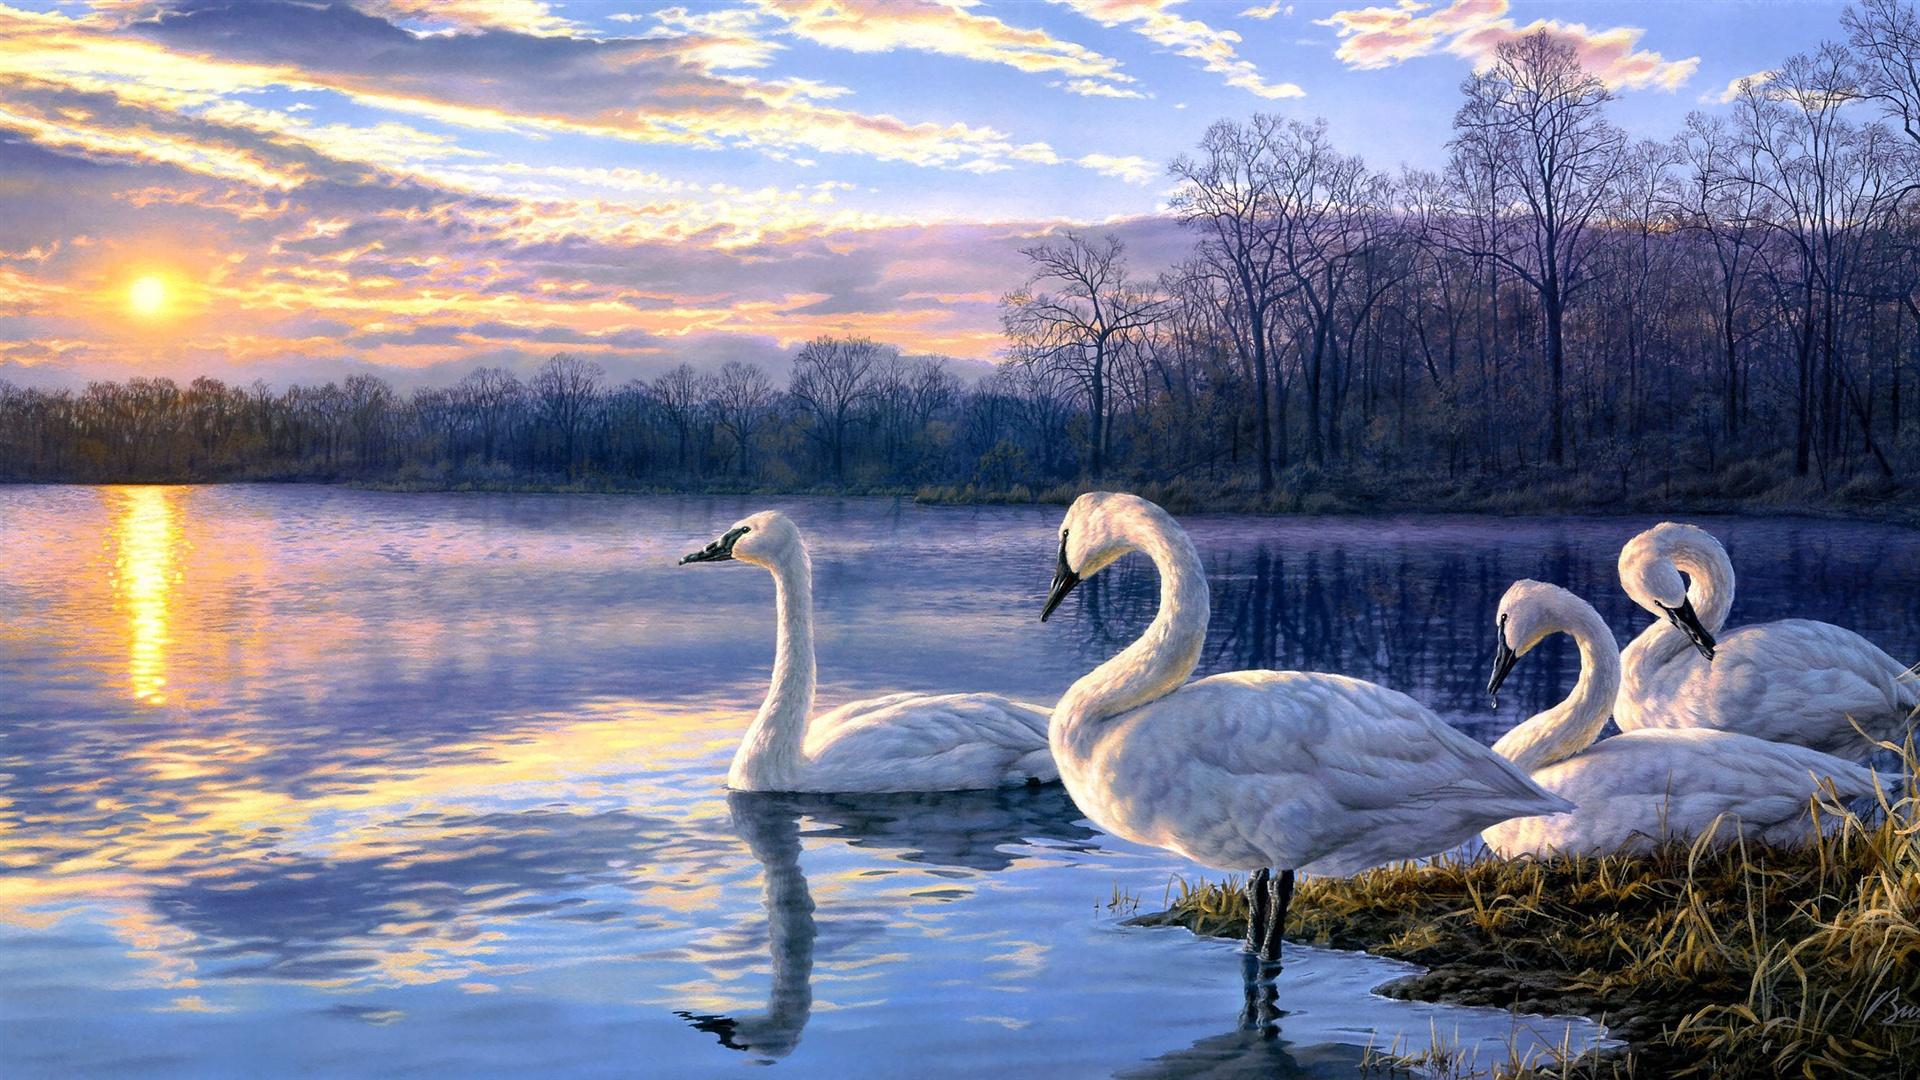 Wallpaper Art painting swan lake sunset landscape 2560x1440 QHD Picture, Image